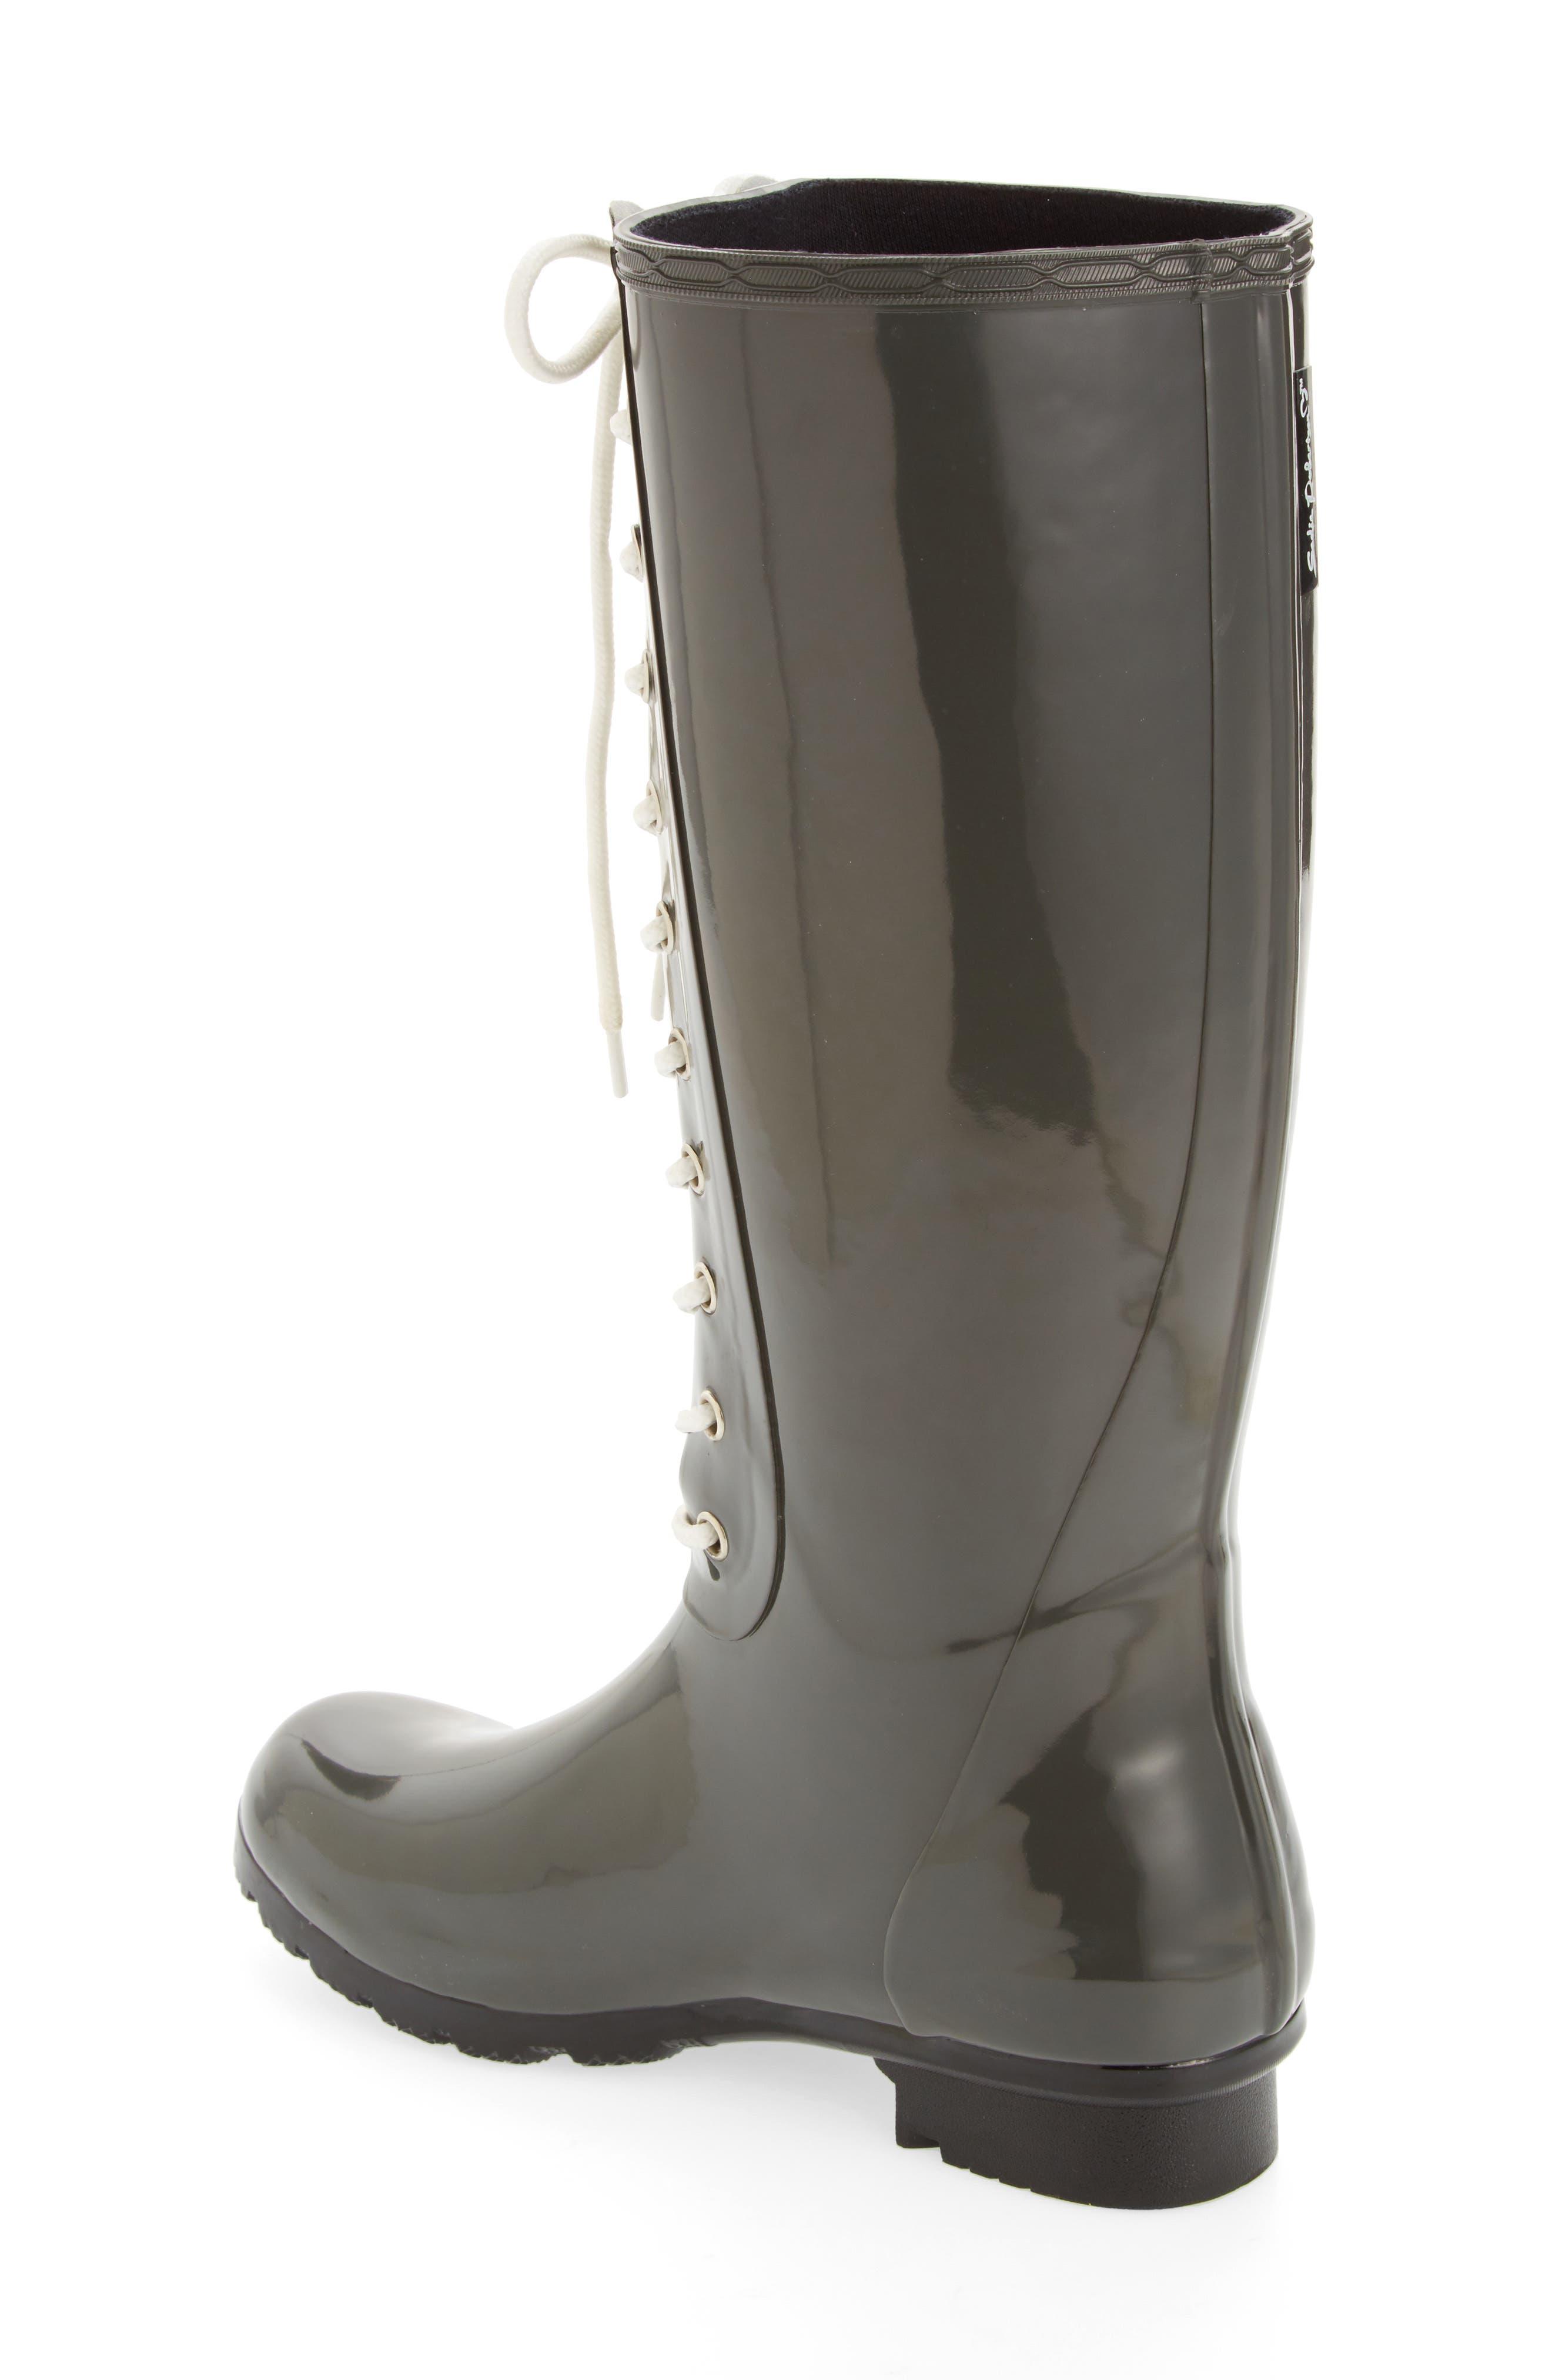 'Opinca' Waterproof Rain Boot,                             Alternate thumbnail 2, color,                             Kale